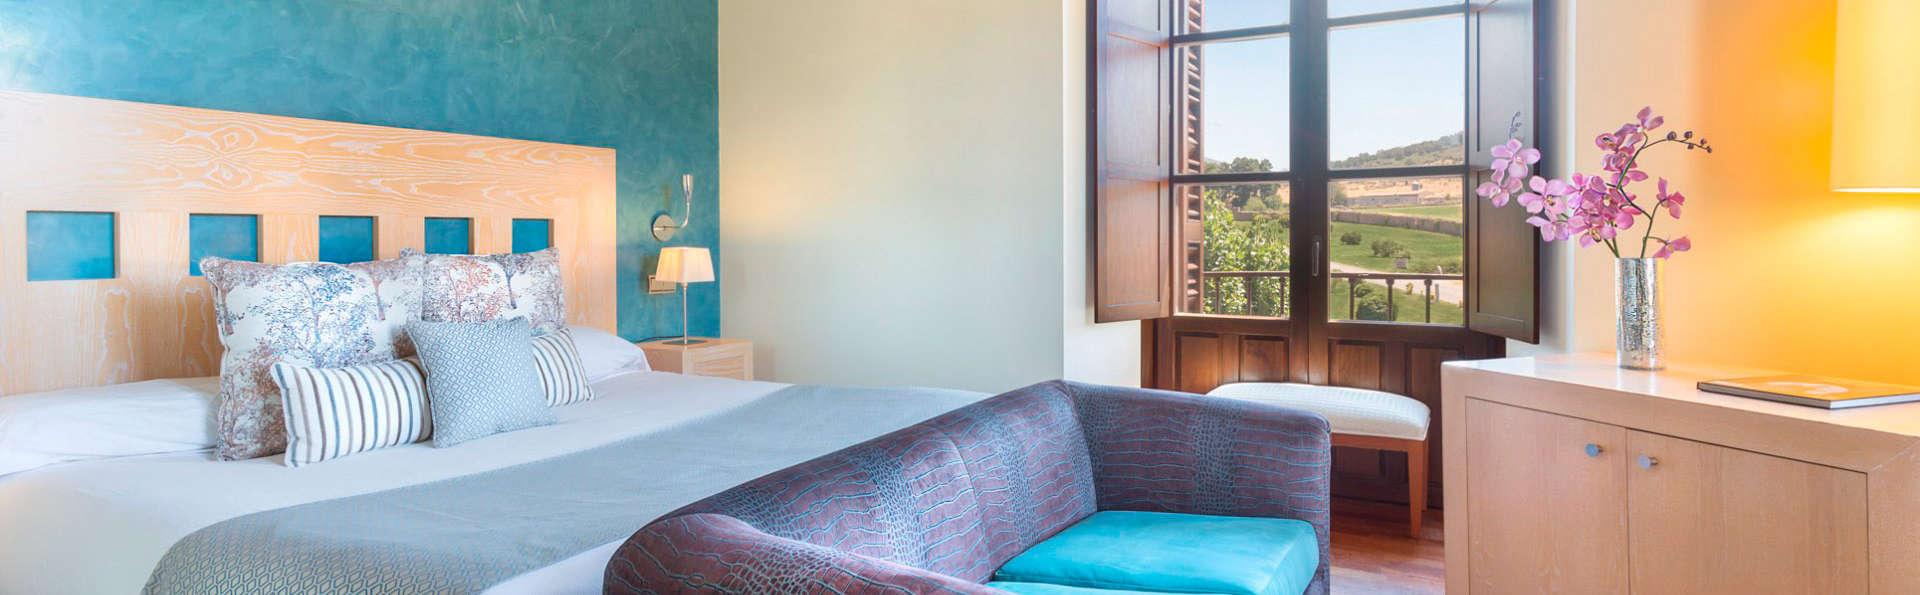 Izan Puerta de Gredos - EDIT_room3.jpg